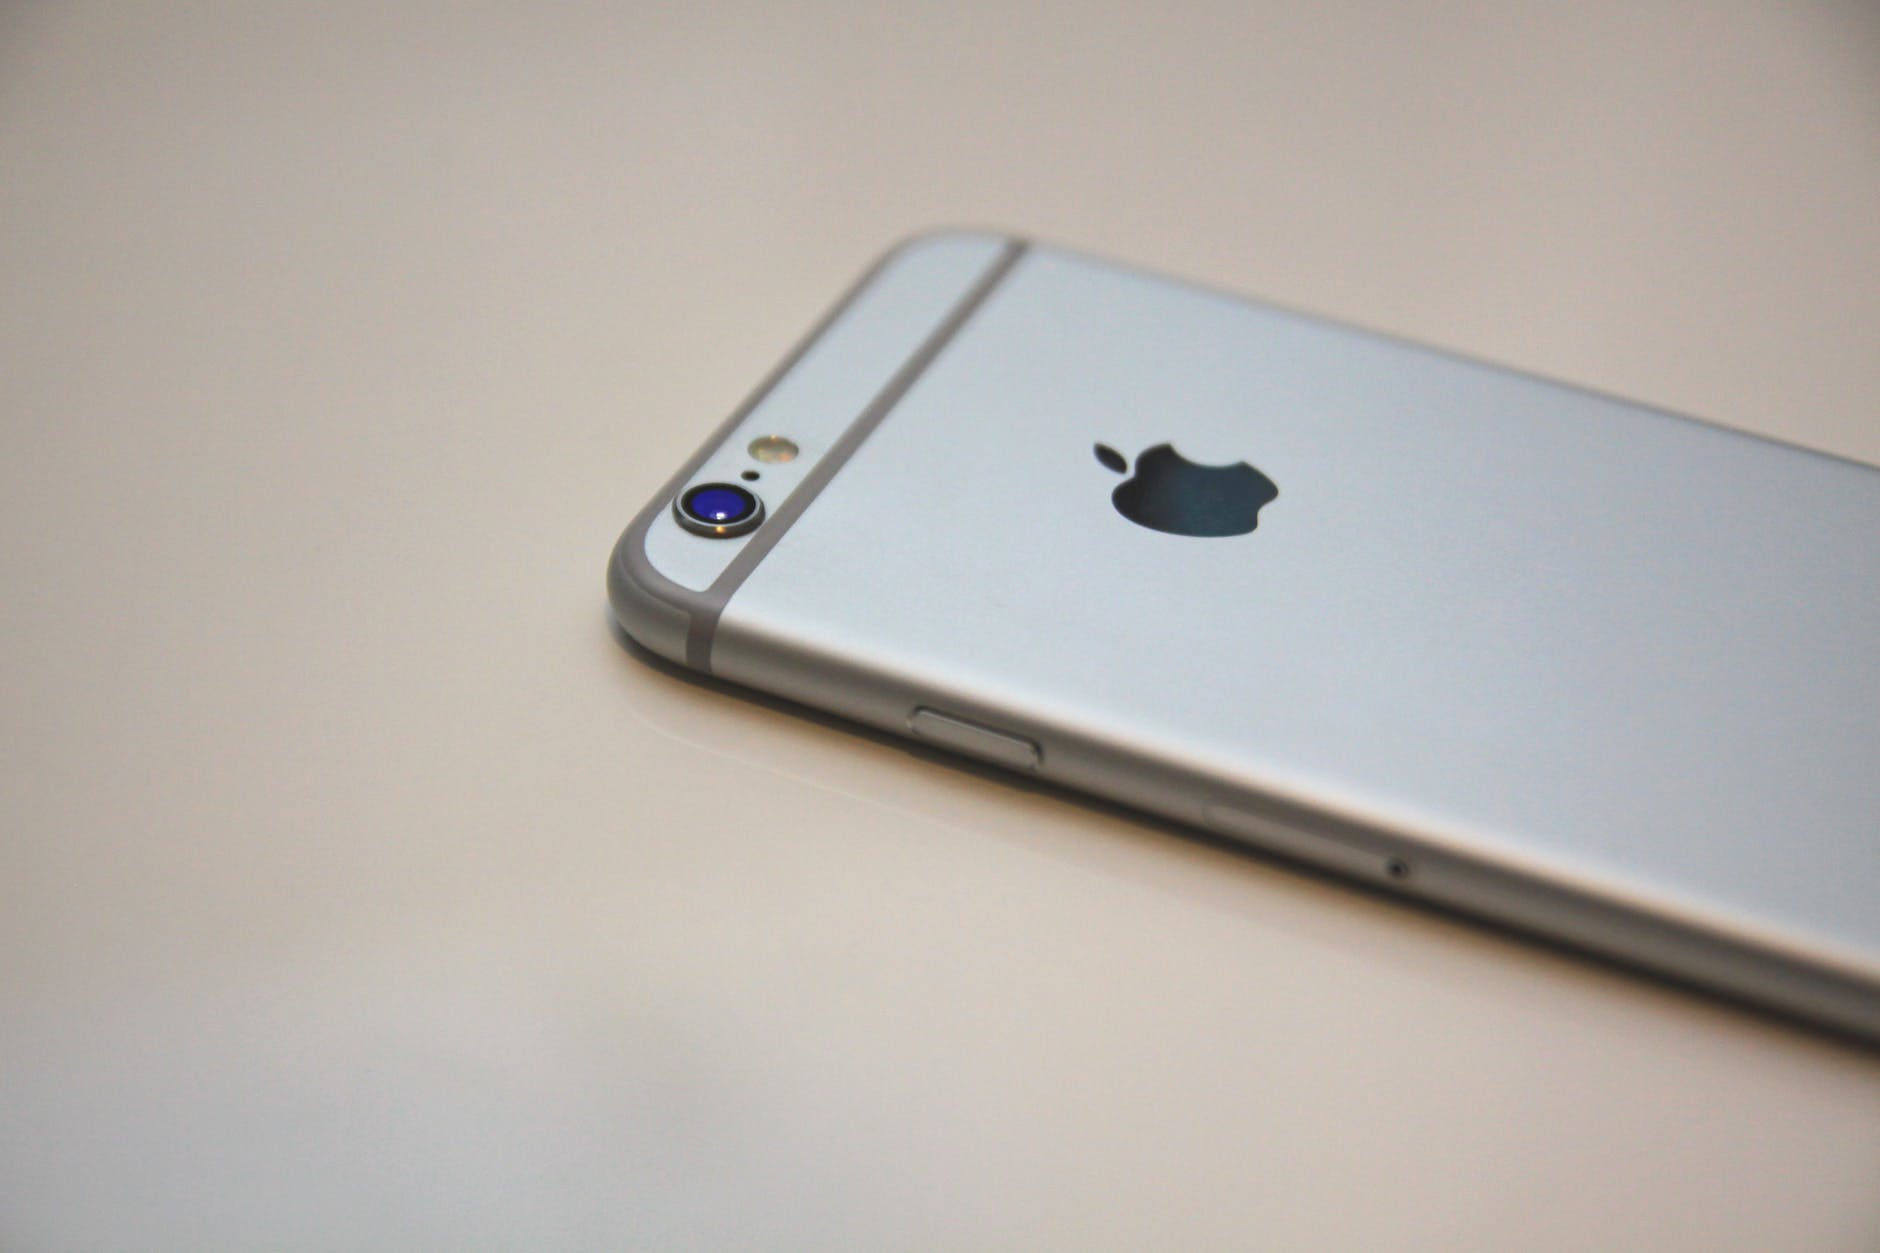 apple apple device cellphone device